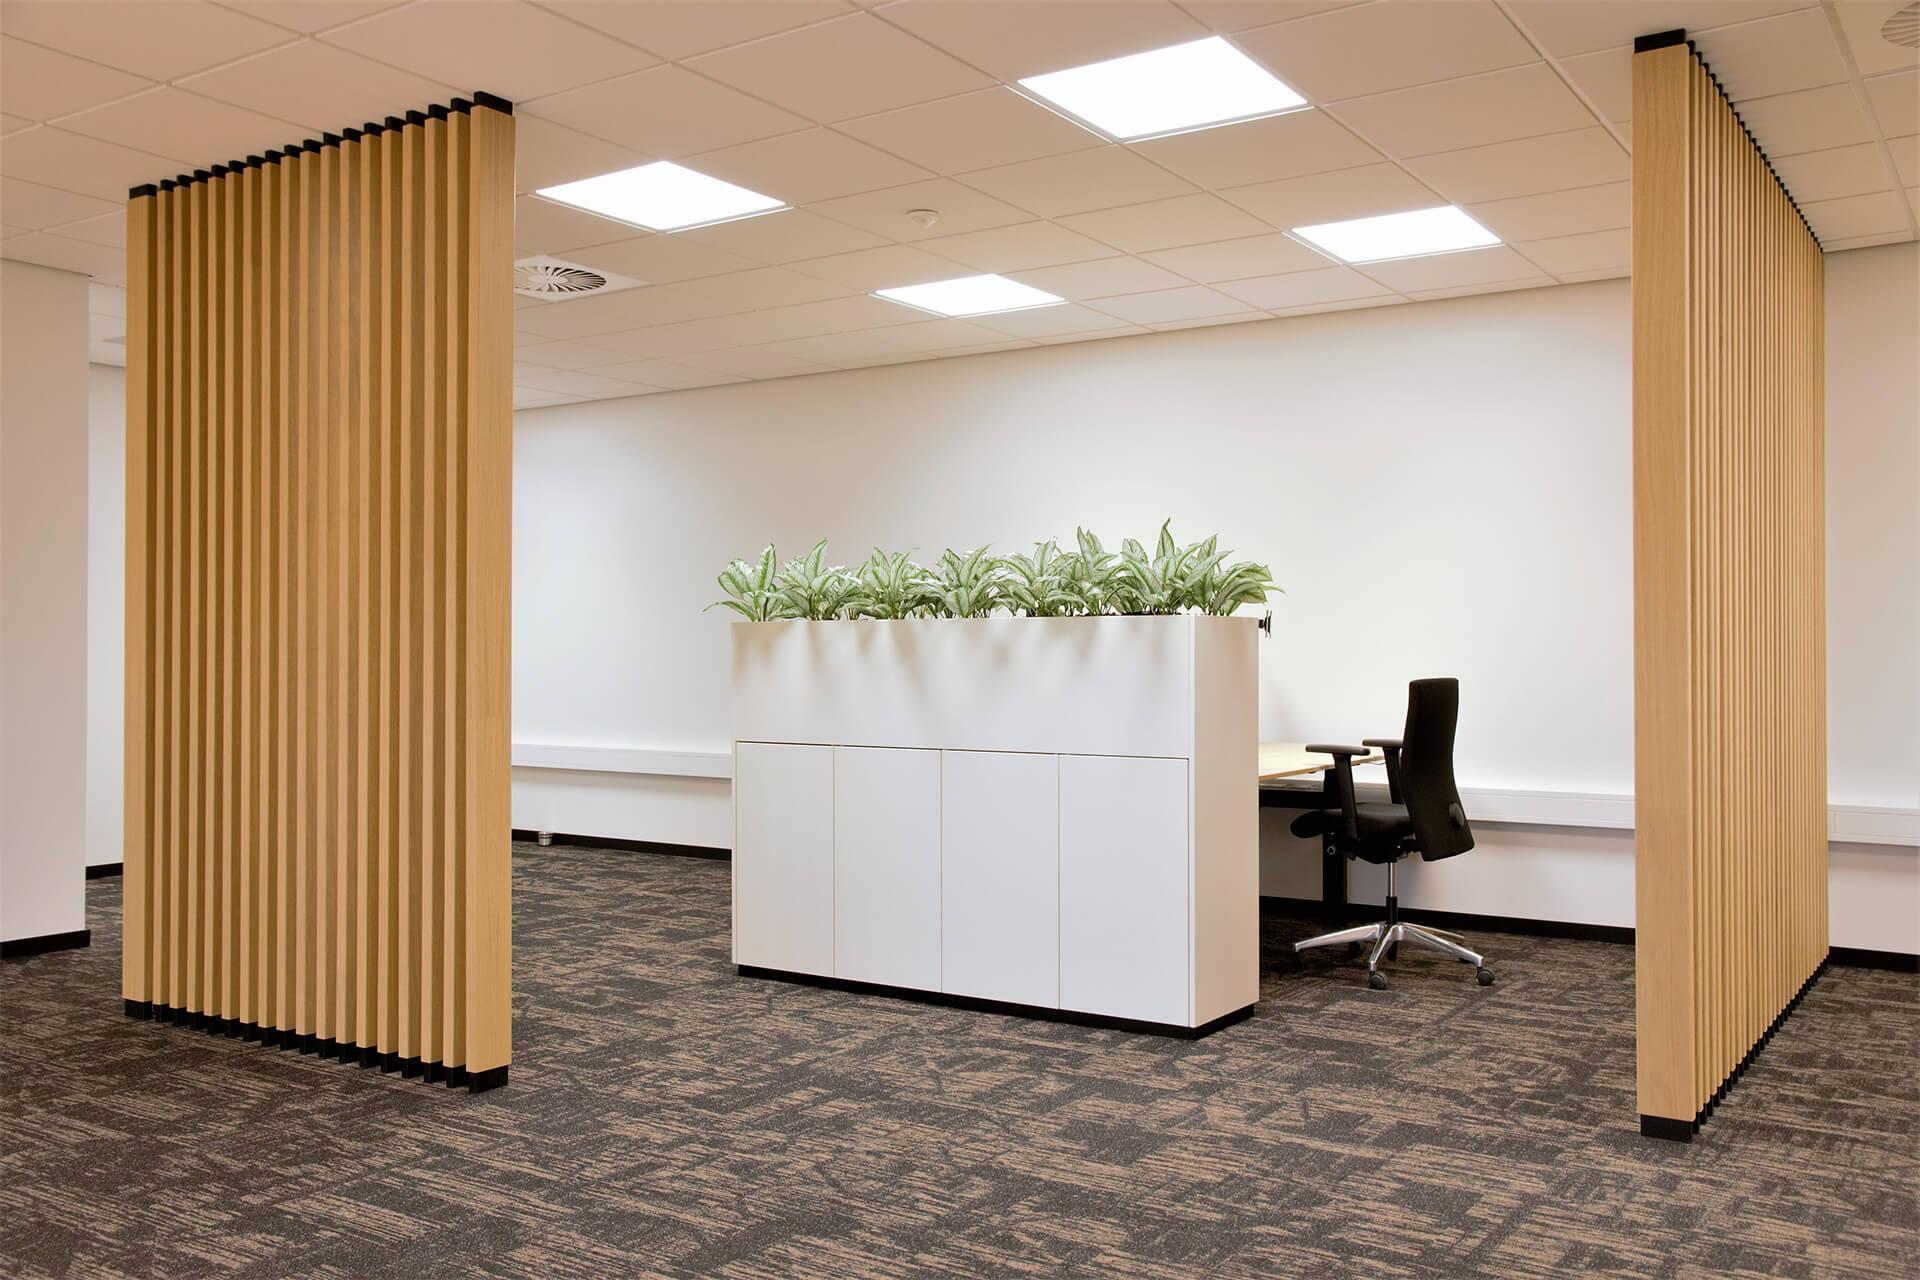 Room divider op kantoor